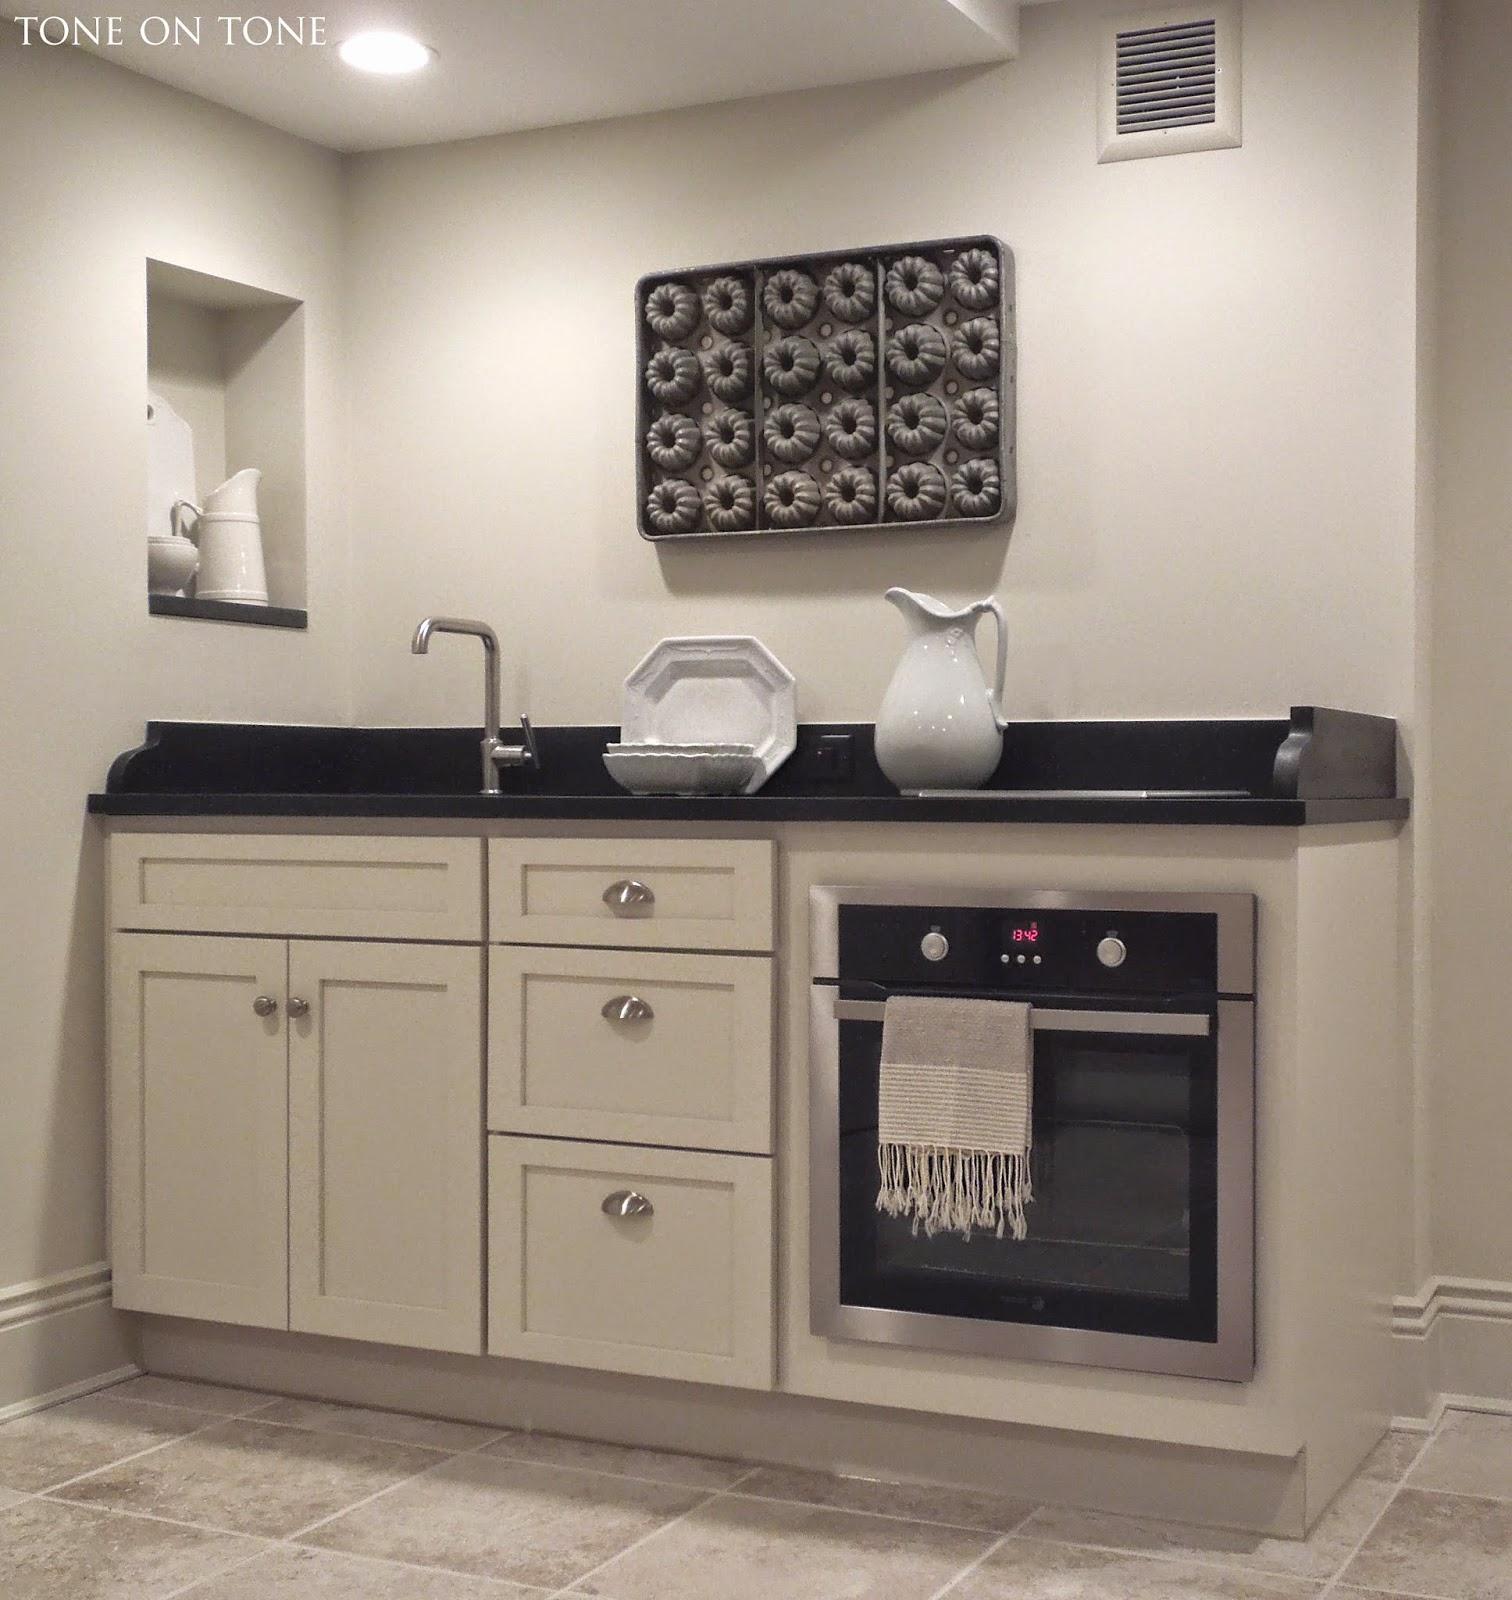 Stunning Apartment Size Appliances Photos - Interior Design Ideas ...